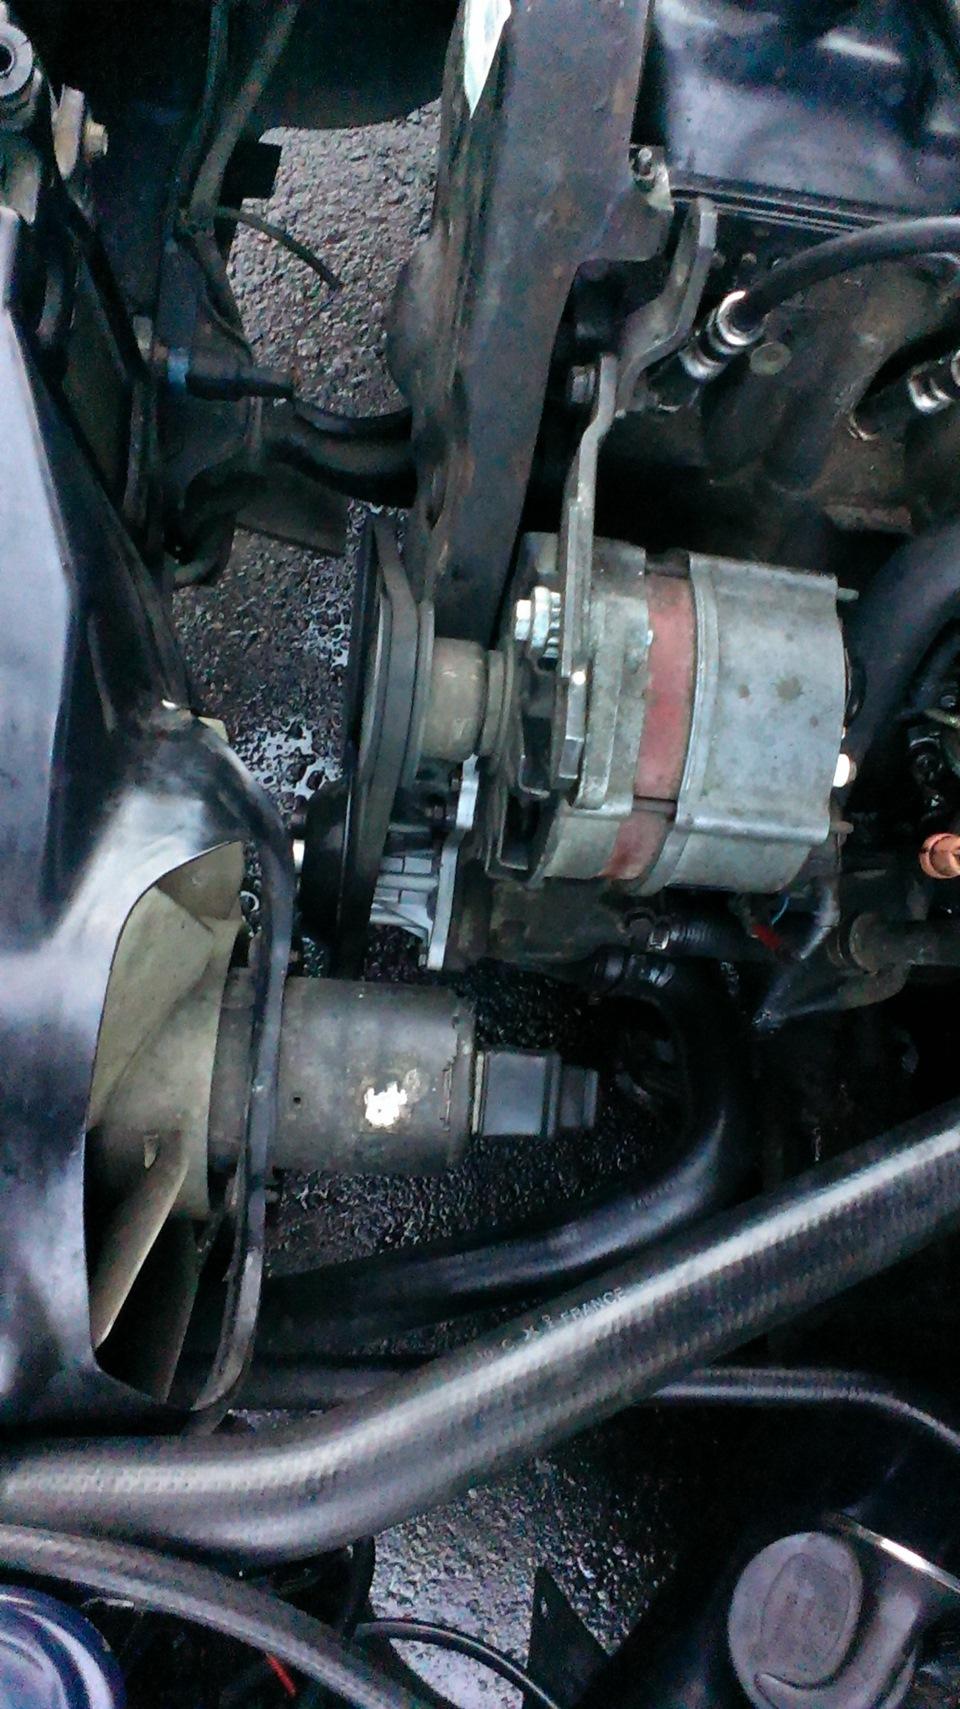 audi 80 b4 abk 2.0 перегрев двигателя